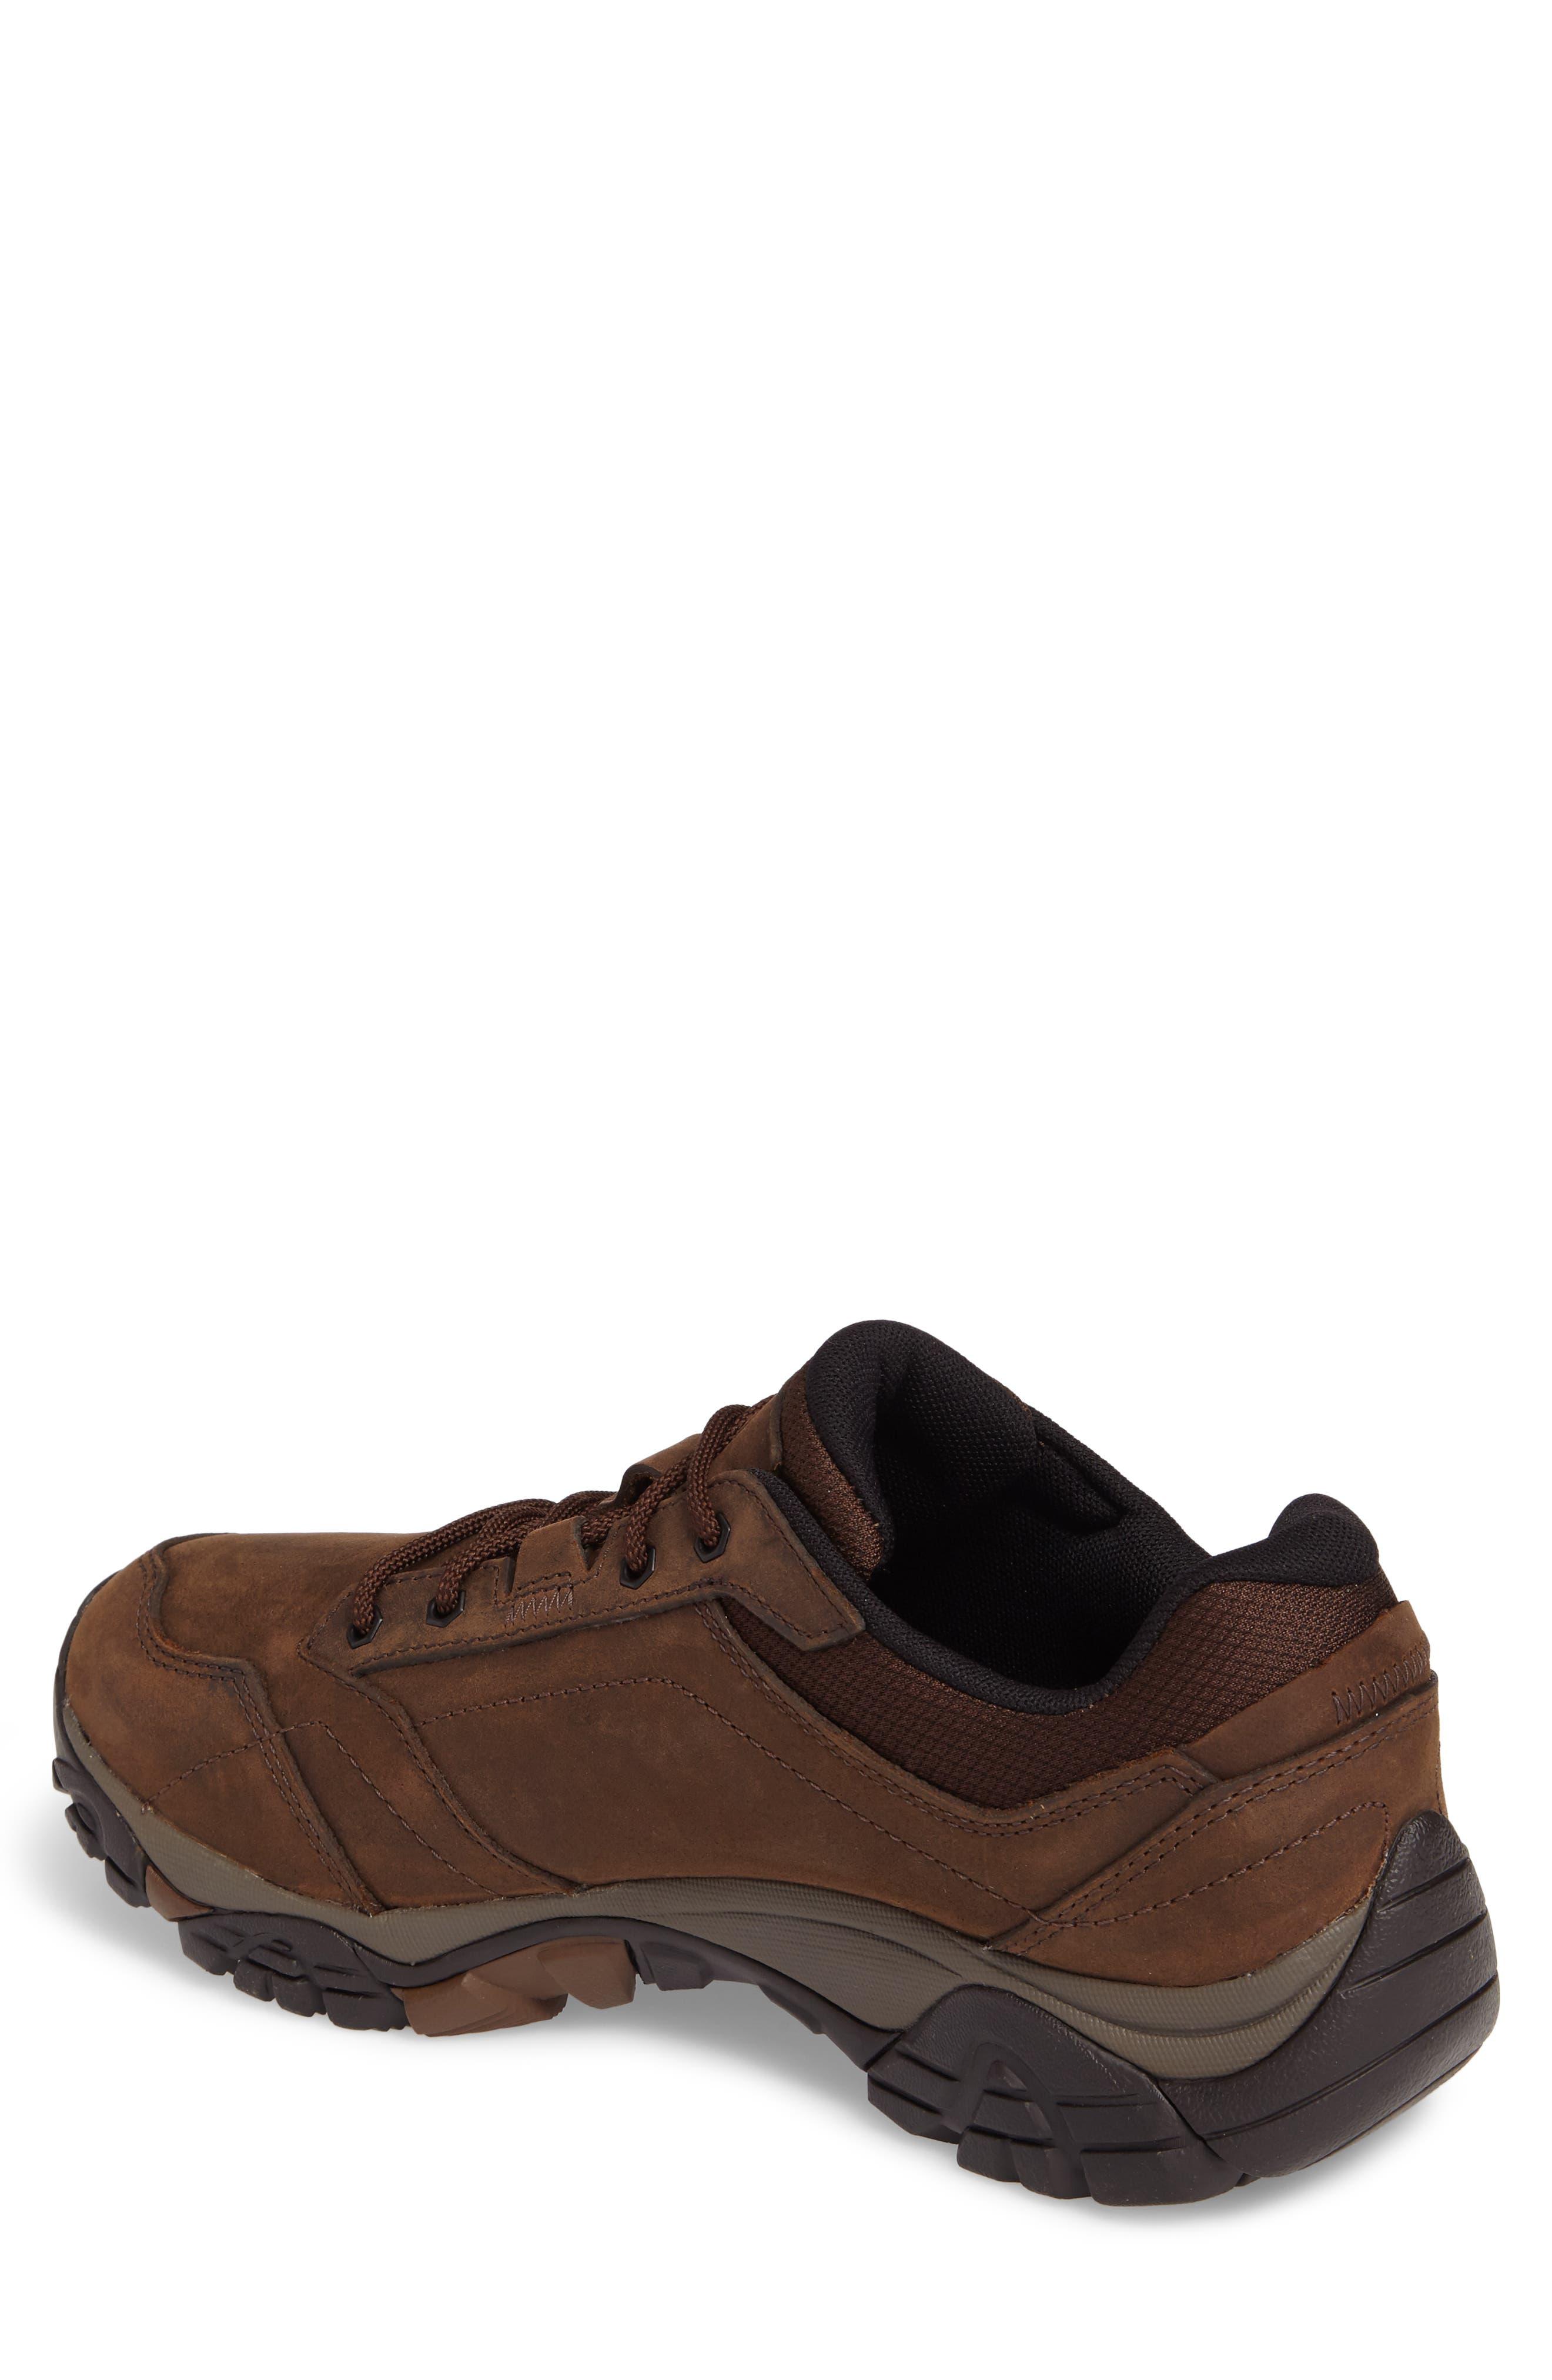 Moab Adventure Hiking Shoe,                             Alternate thumbnail 2, color,                             Dark Earth Nubuck Leather